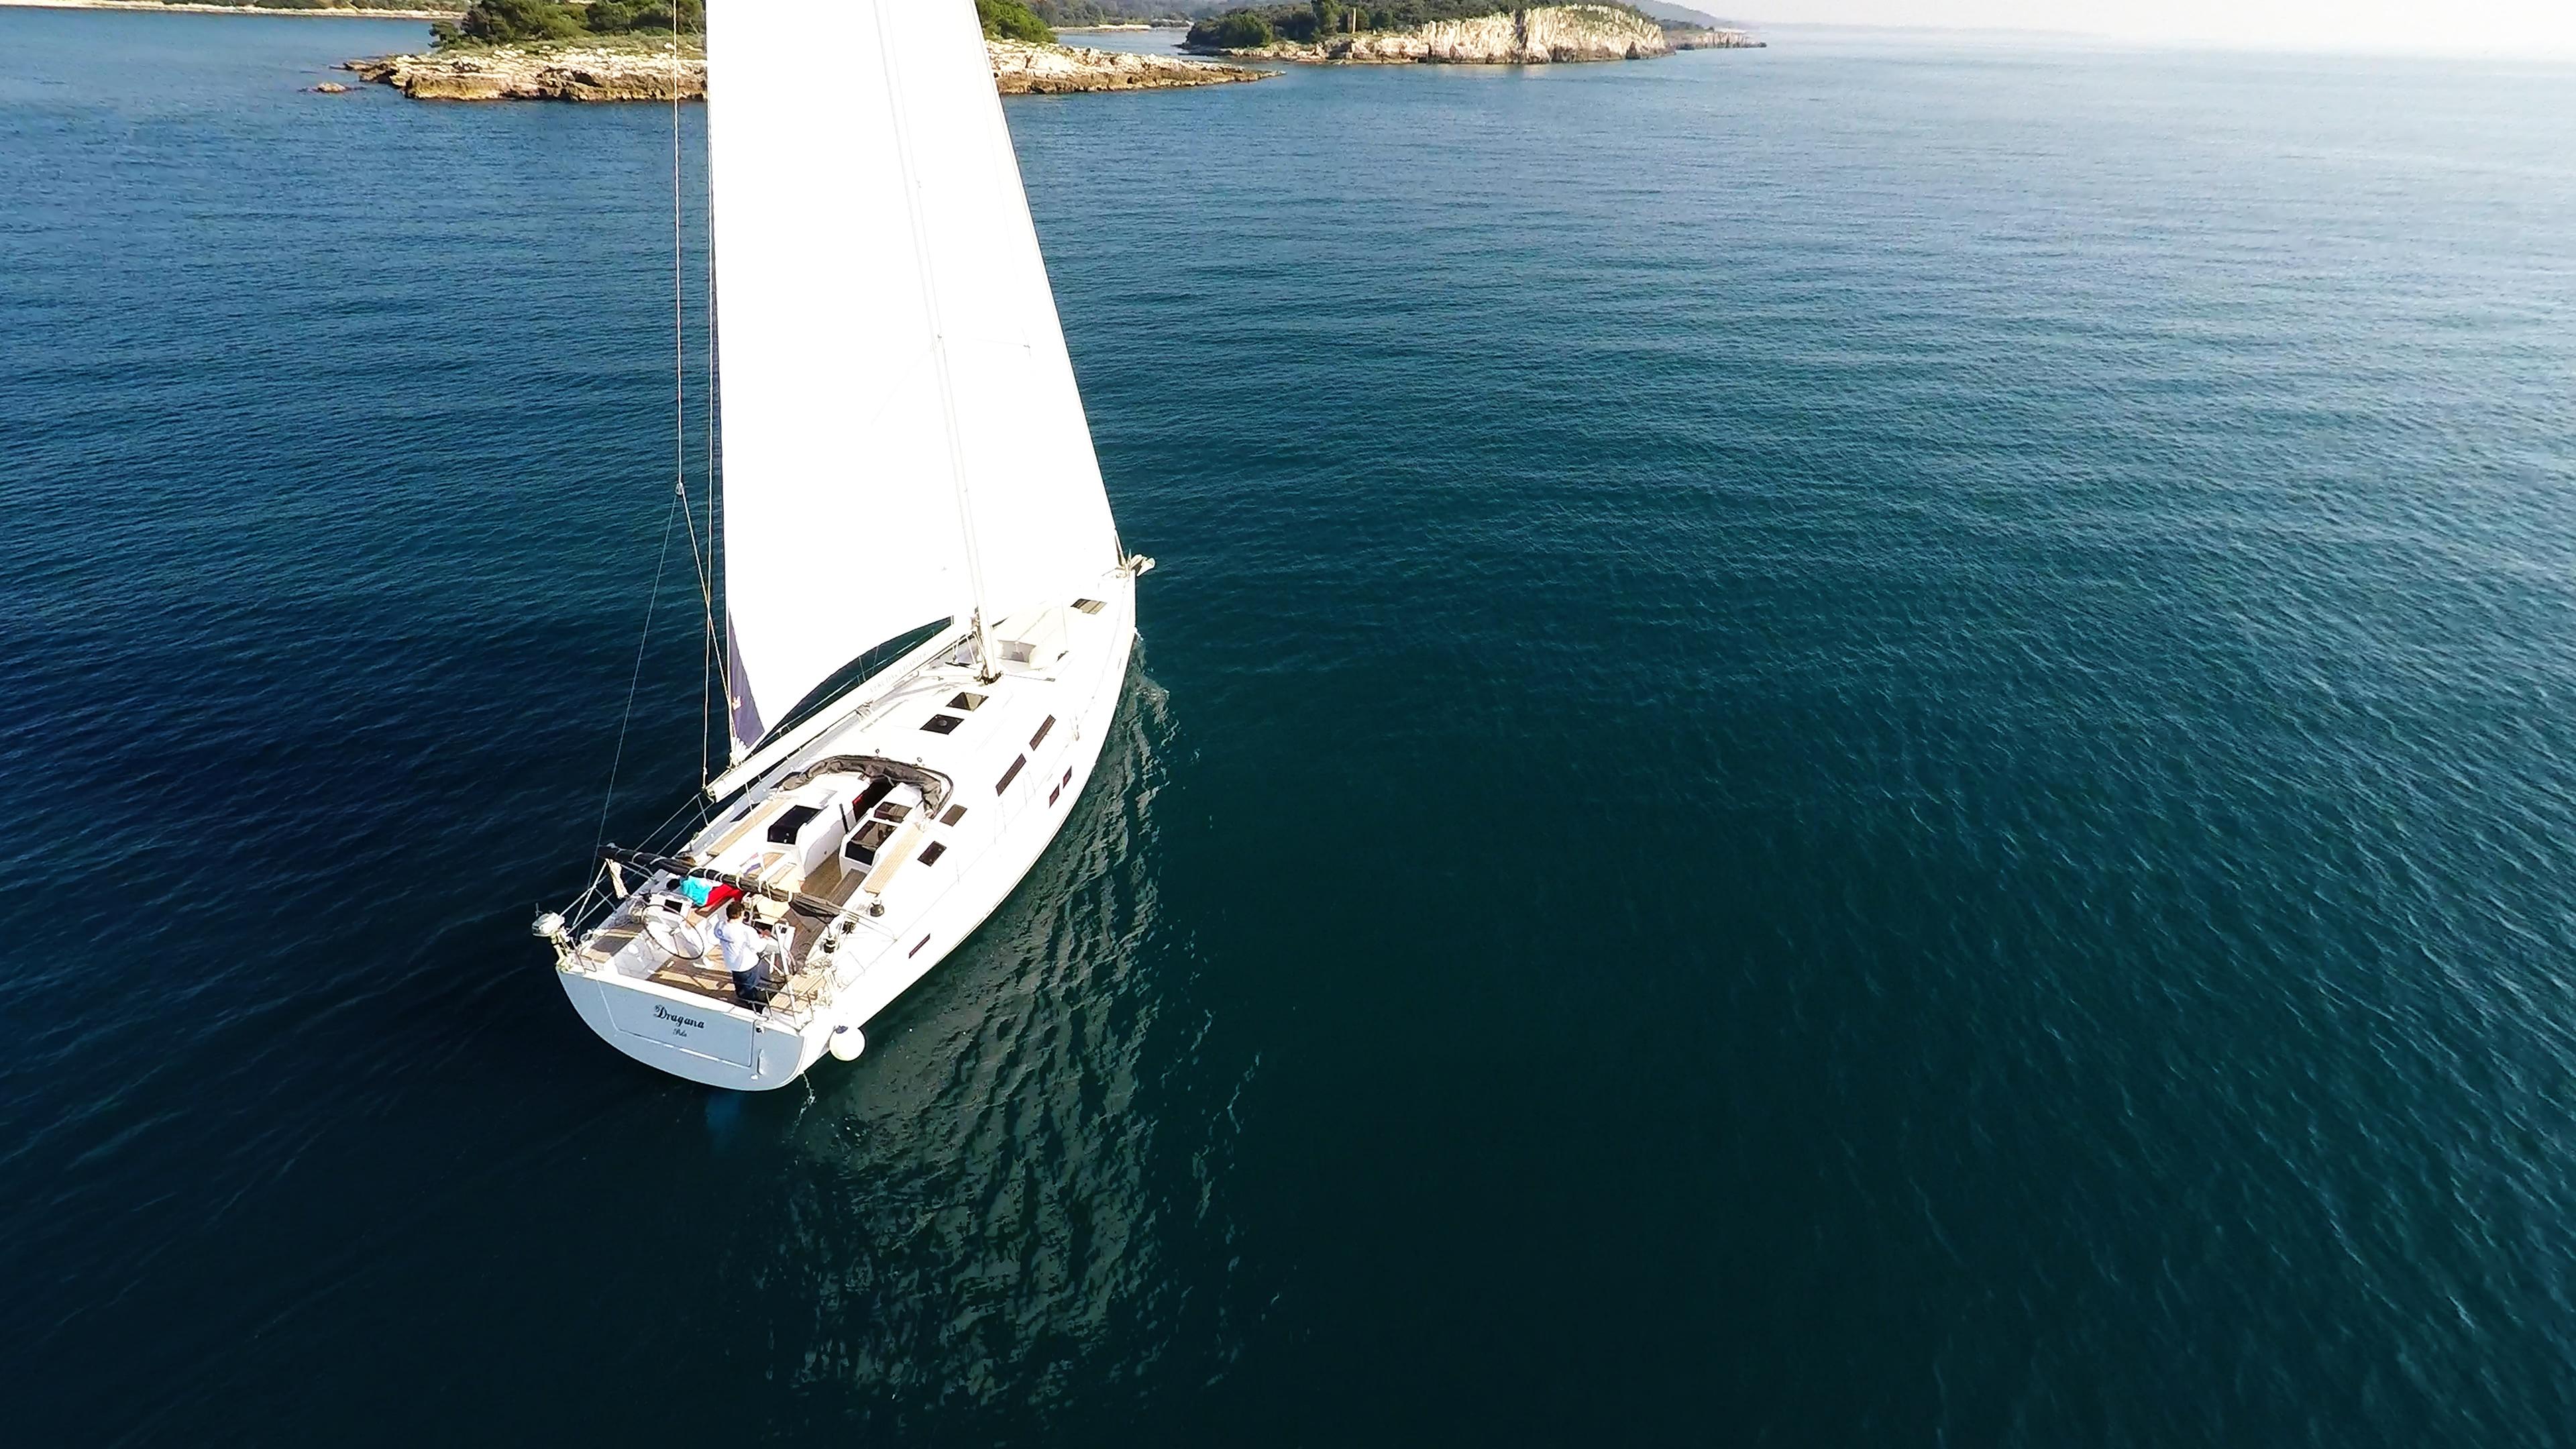 Segelyacht Boot Segeln zu den Meeresinseln Blau Segelboot Yacht